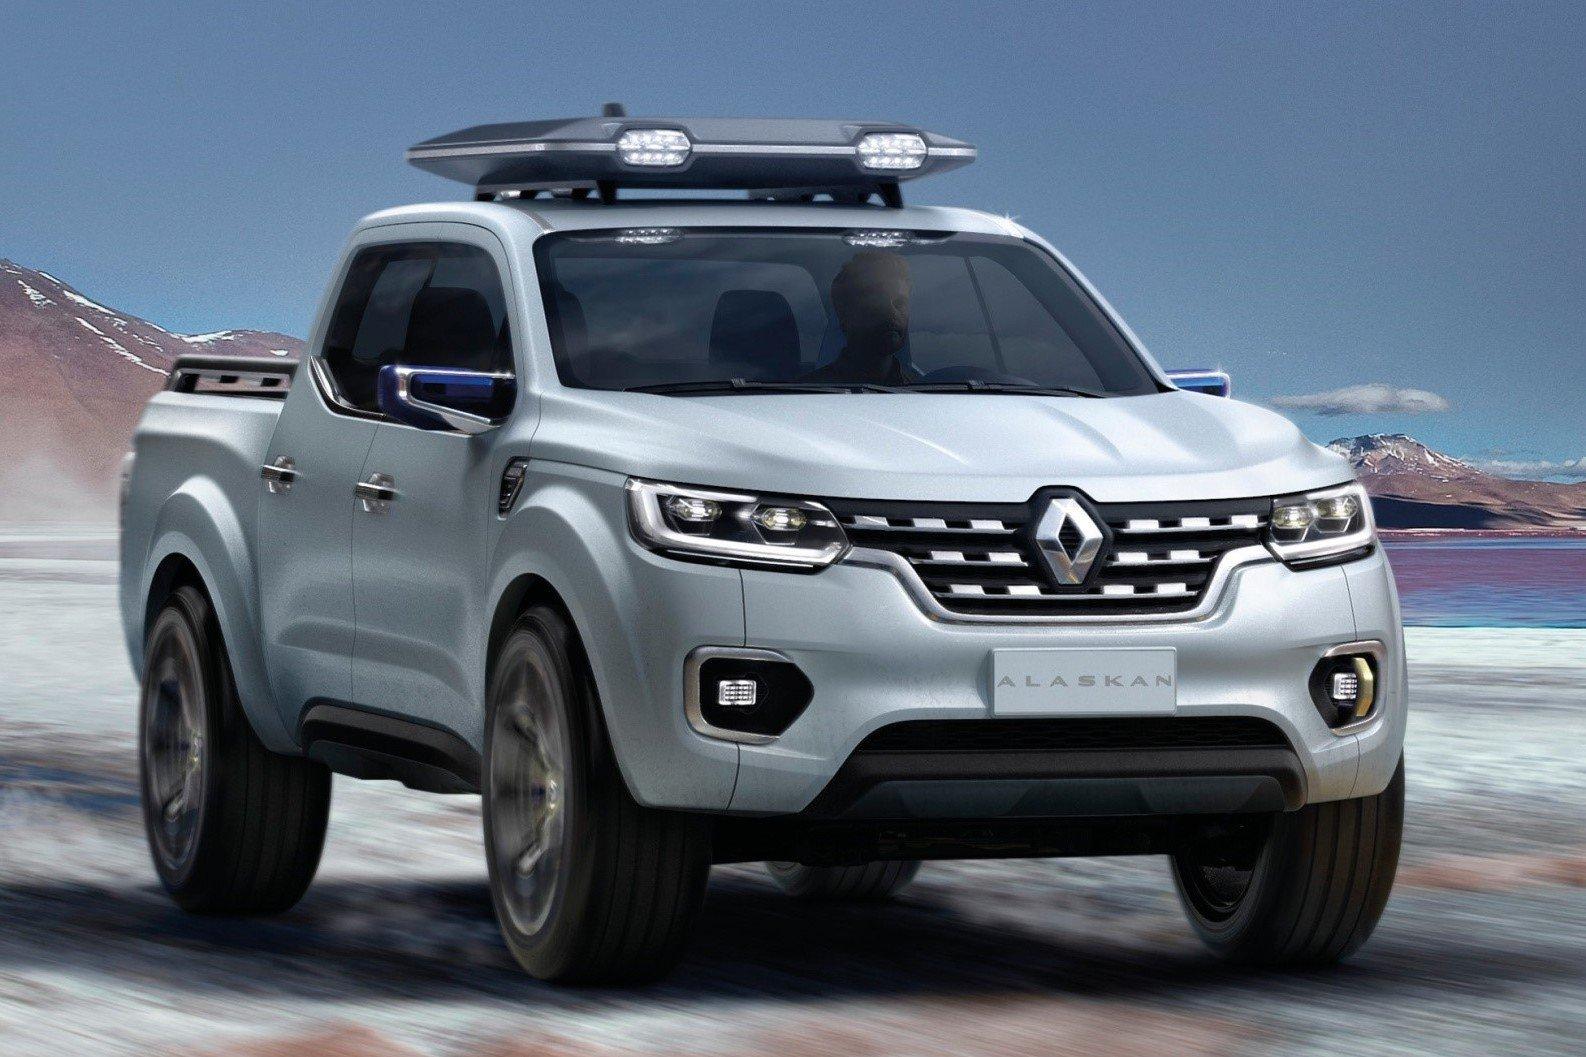 Renault Alaskan pick-up truck concept unveiled; Frankfurt debut ...